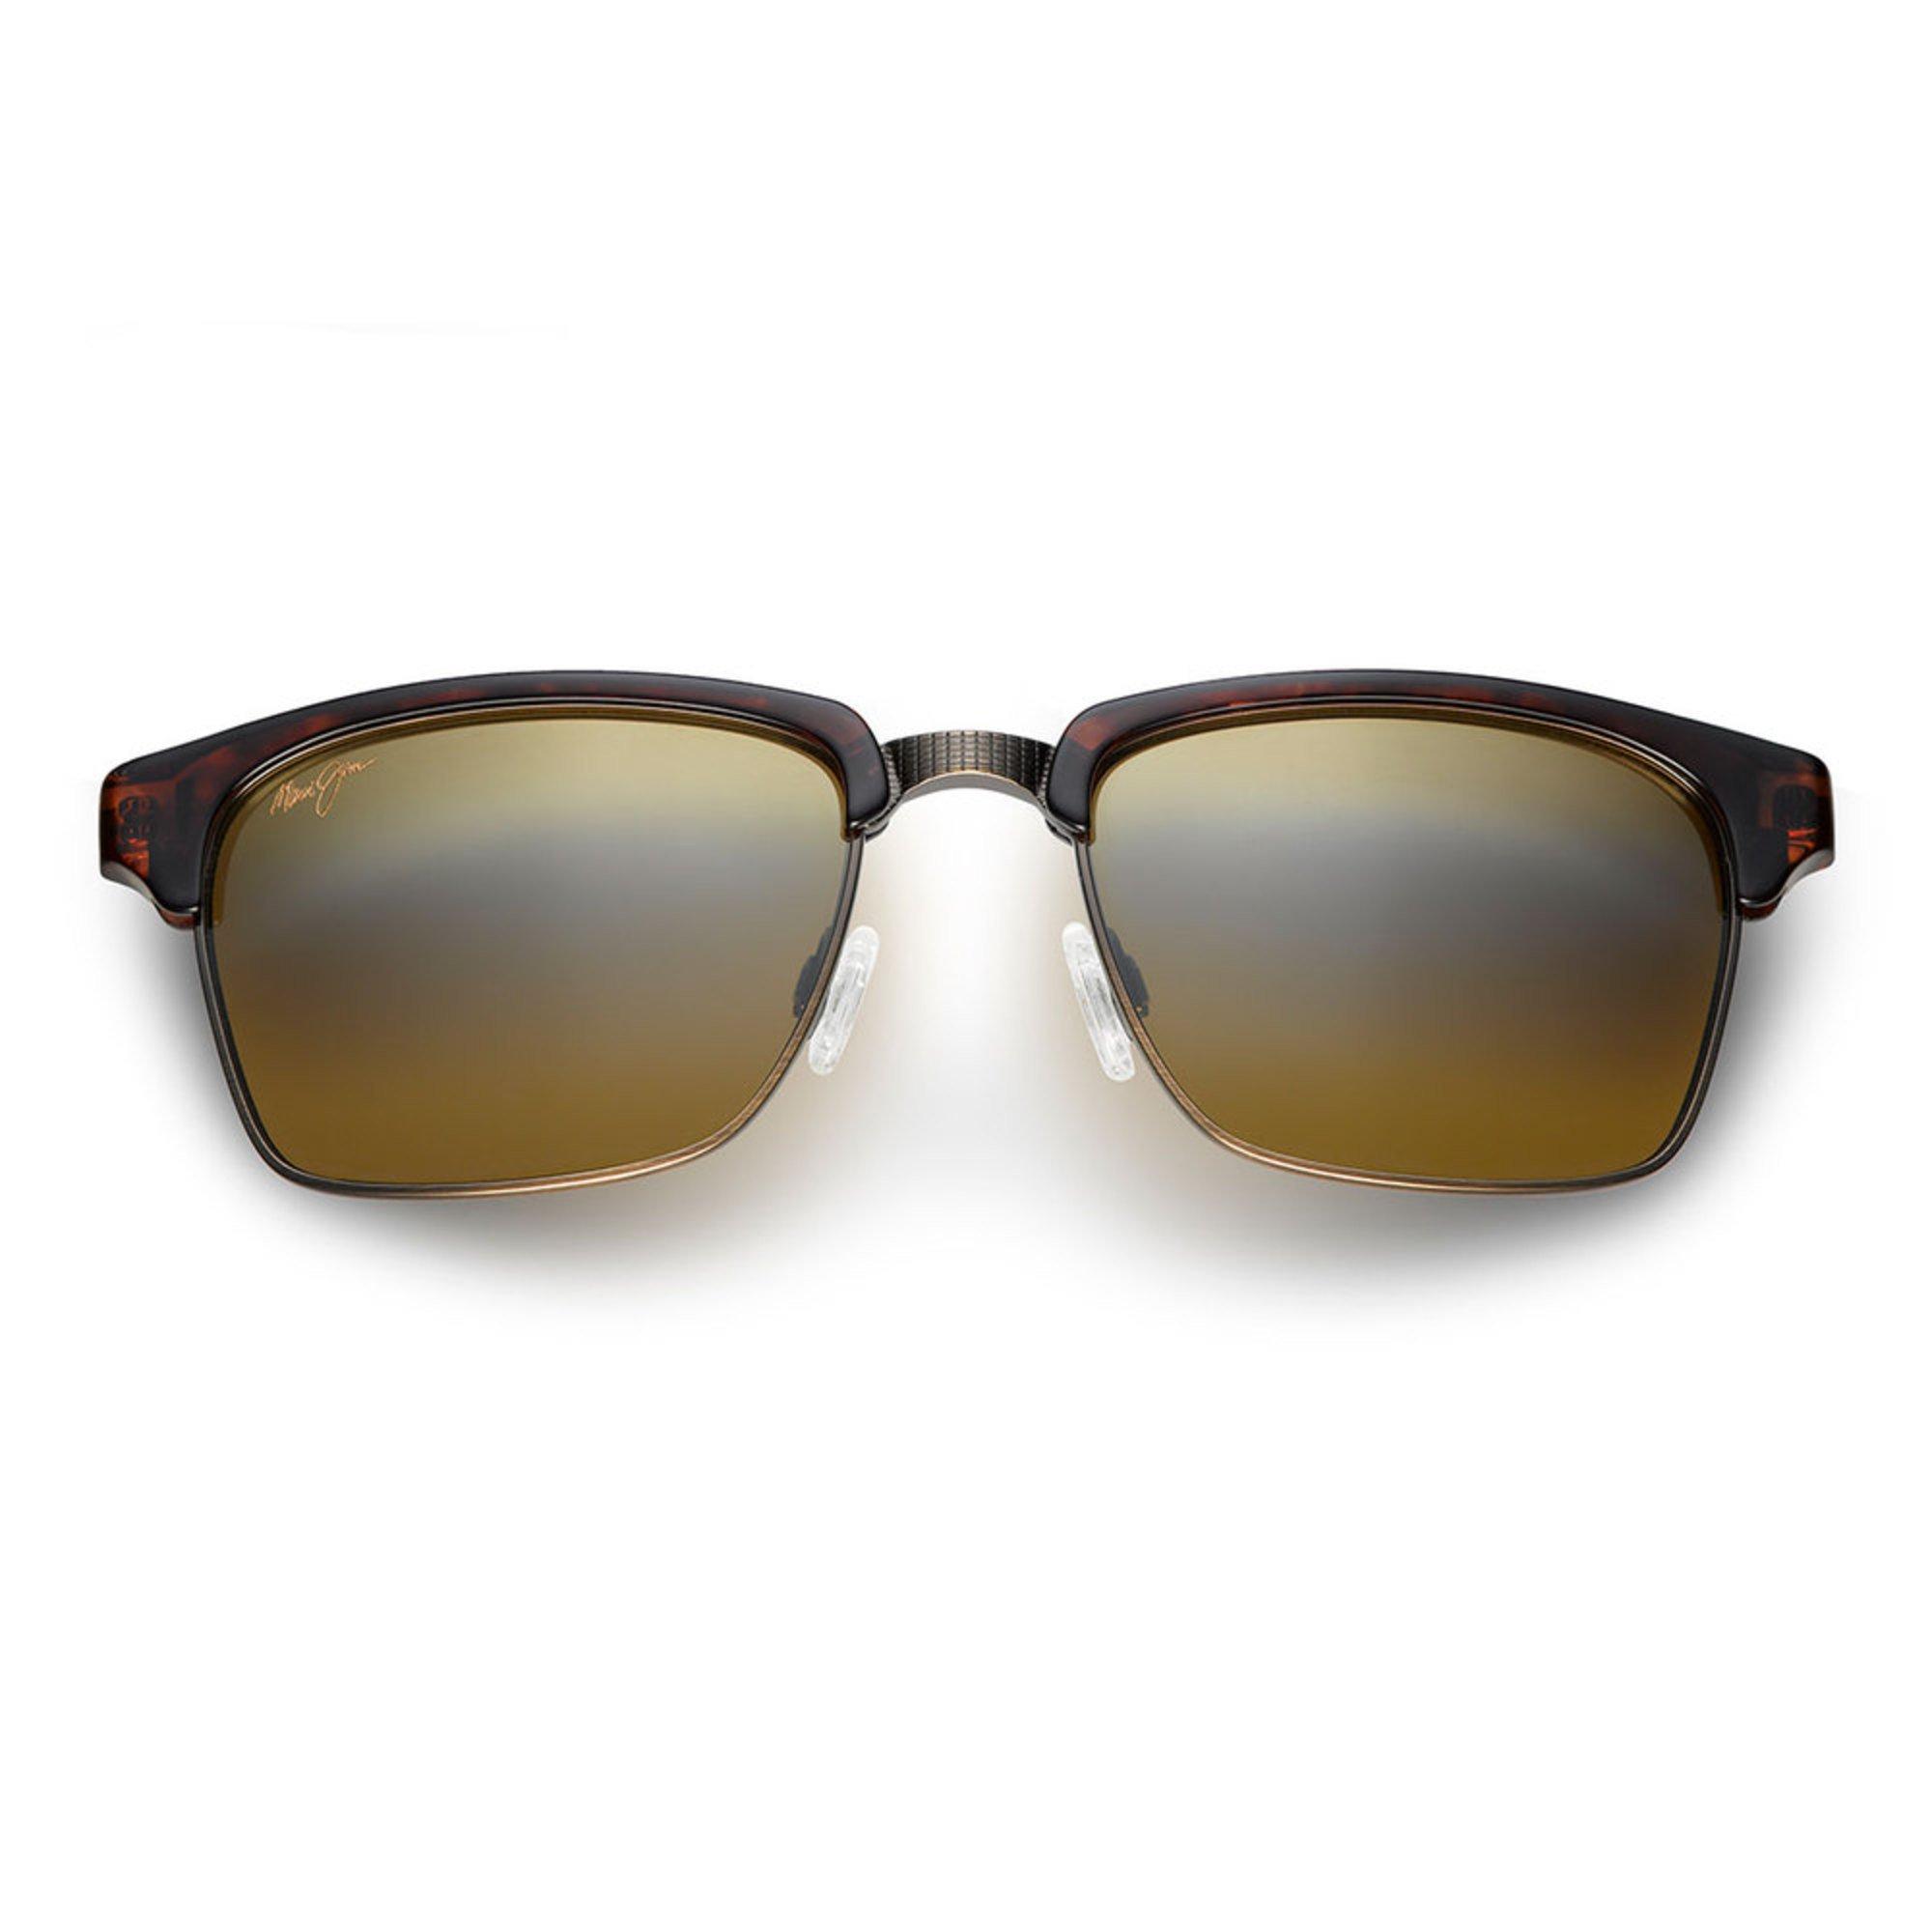 fbd6410f58ca Maui Jim. Maui Jim Unisex Kawika Tortoise with Antique Gold Polarized  Classic Sunglasses